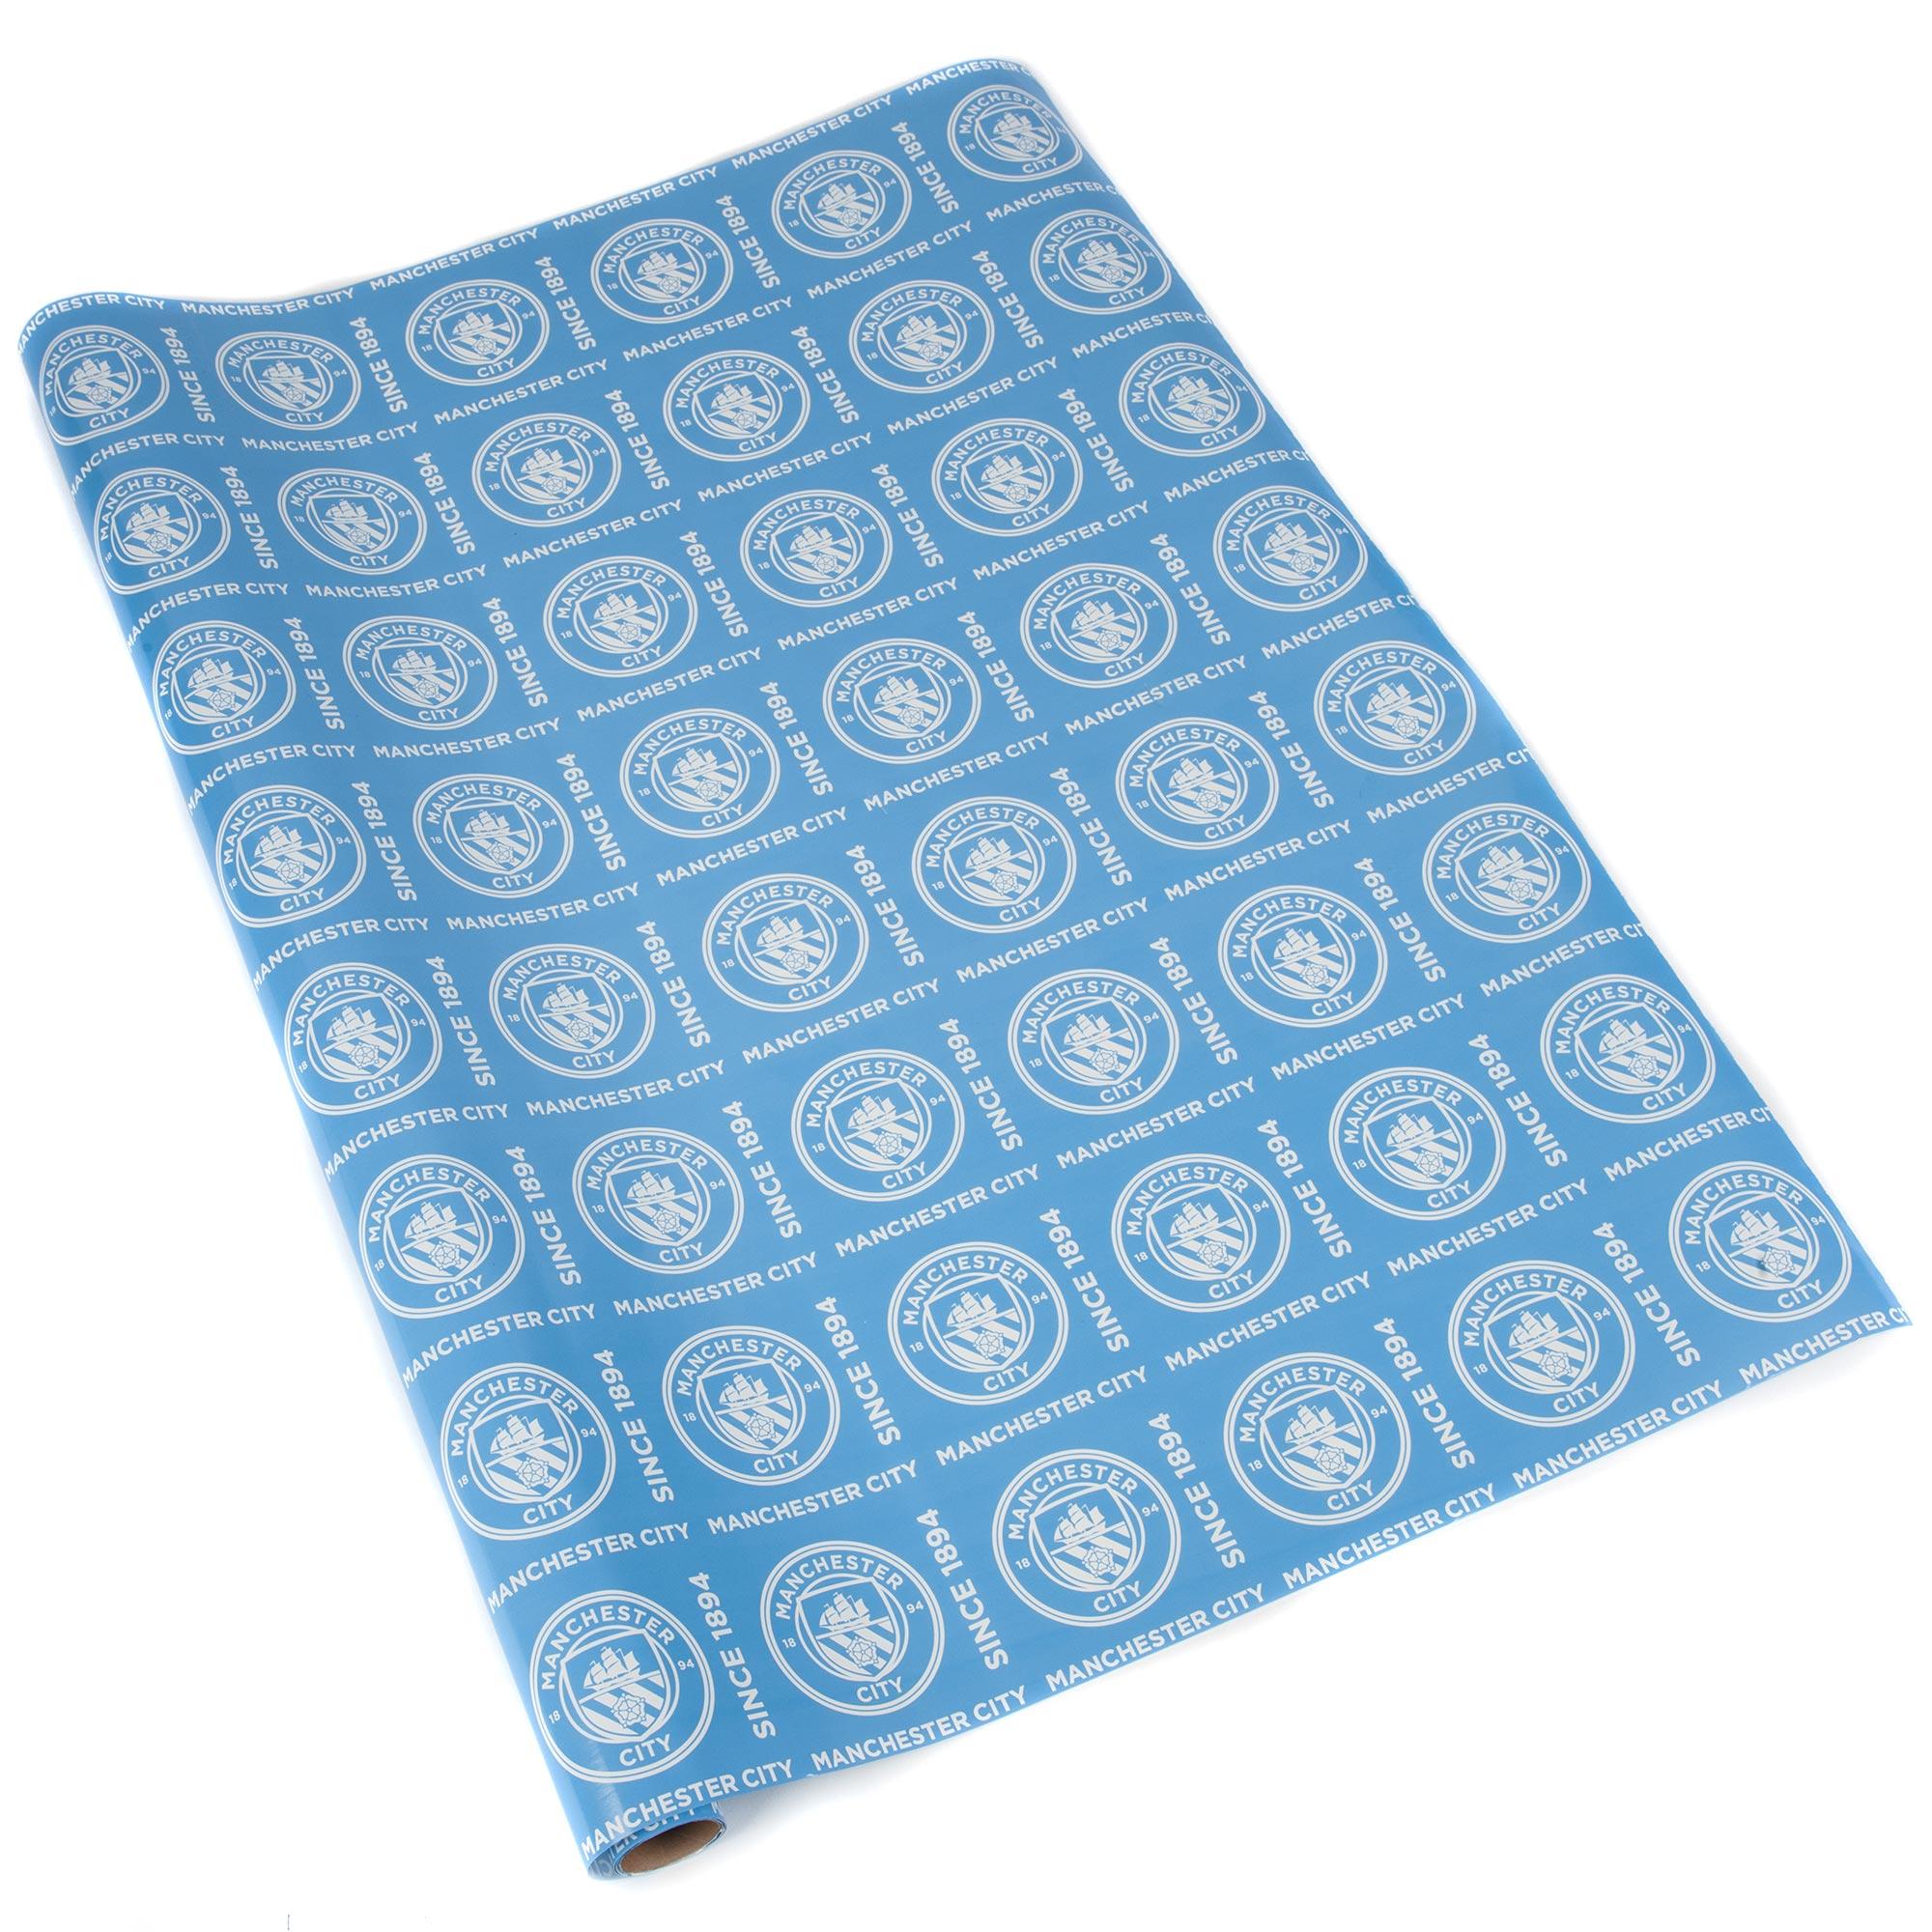 Manchester City Gift Wrap - 75 x 240cm